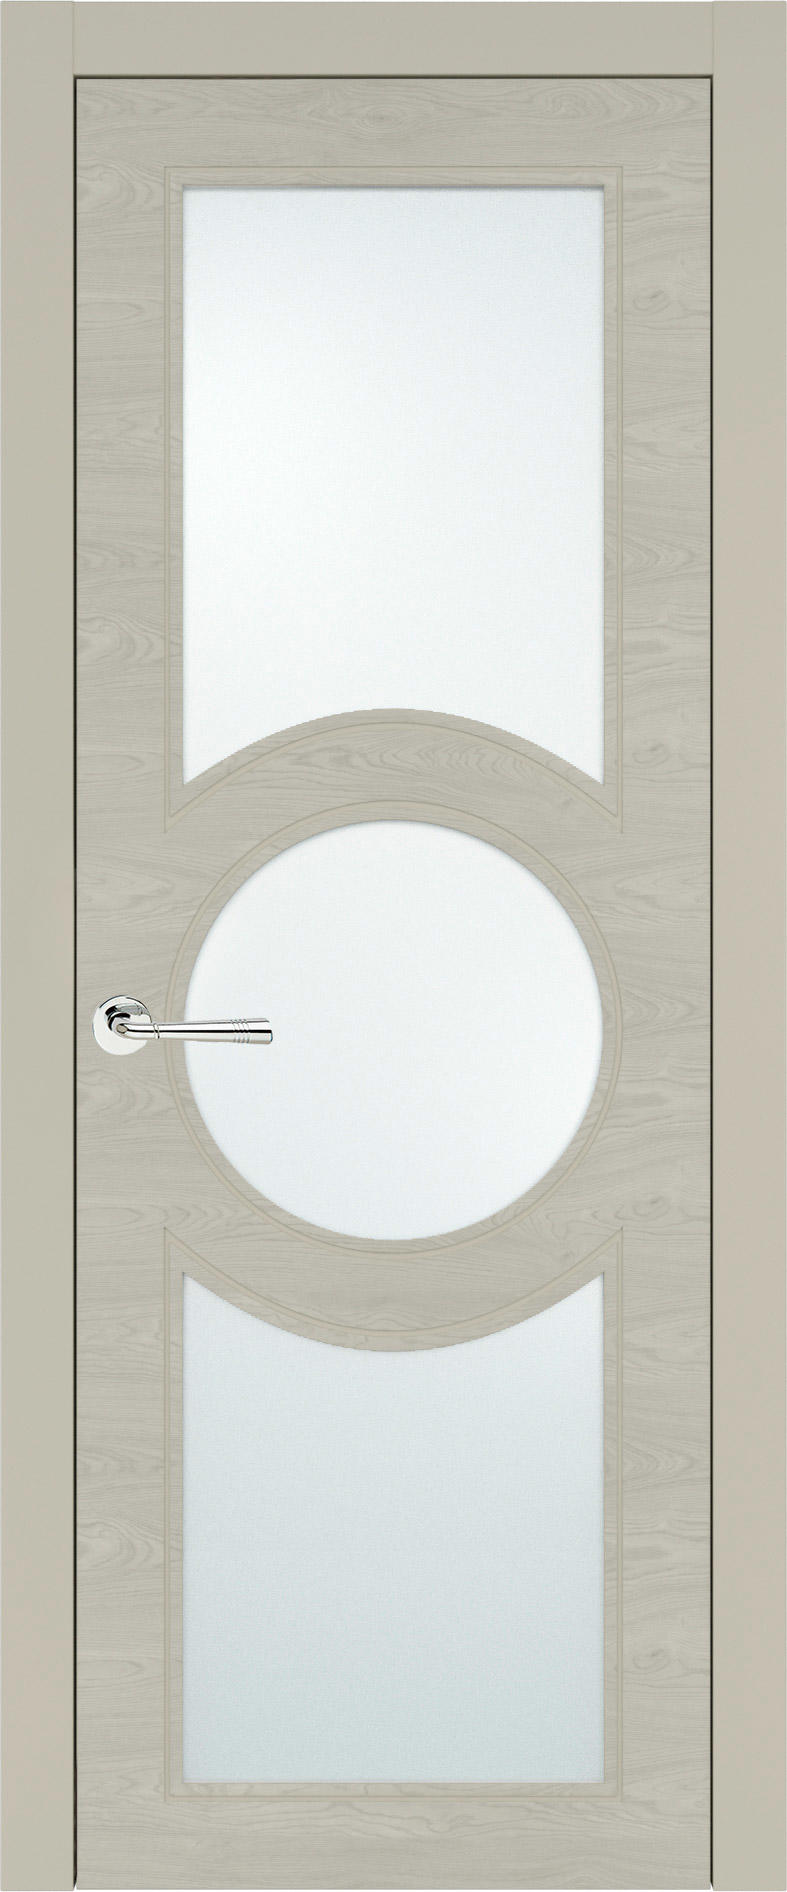 Ravenna Neo Classic цвет - Серо-оливковая эмаль по шпону (RAL 7032) Со стеклом (ДО)